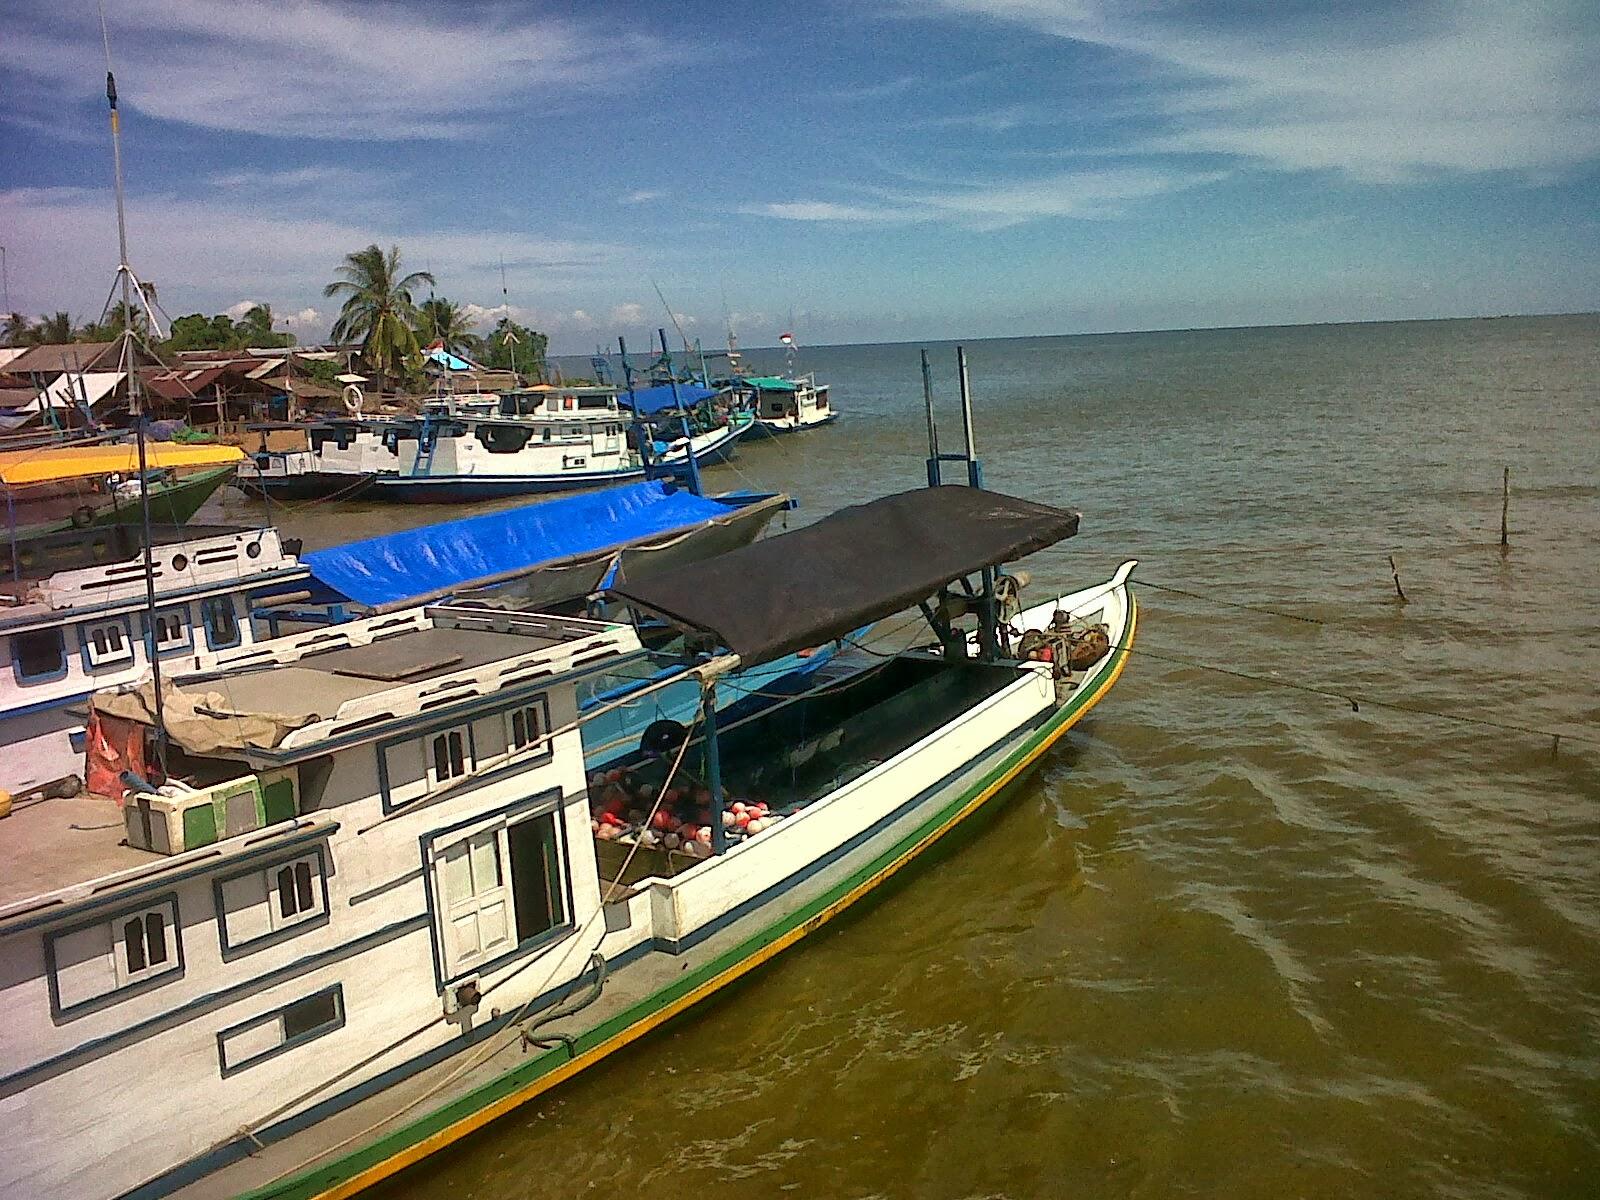 Survei Perhitungan Volume Produk Olahan Hasil Perikanan Skala Umkm Ukm Bumn Ikan Nila Dalam Rangka Pencapaian Indikator Kinerja Utama Direktorat Pengolahan Yaitu Sebesar 5 Juta Ton Pada Tahun 2013